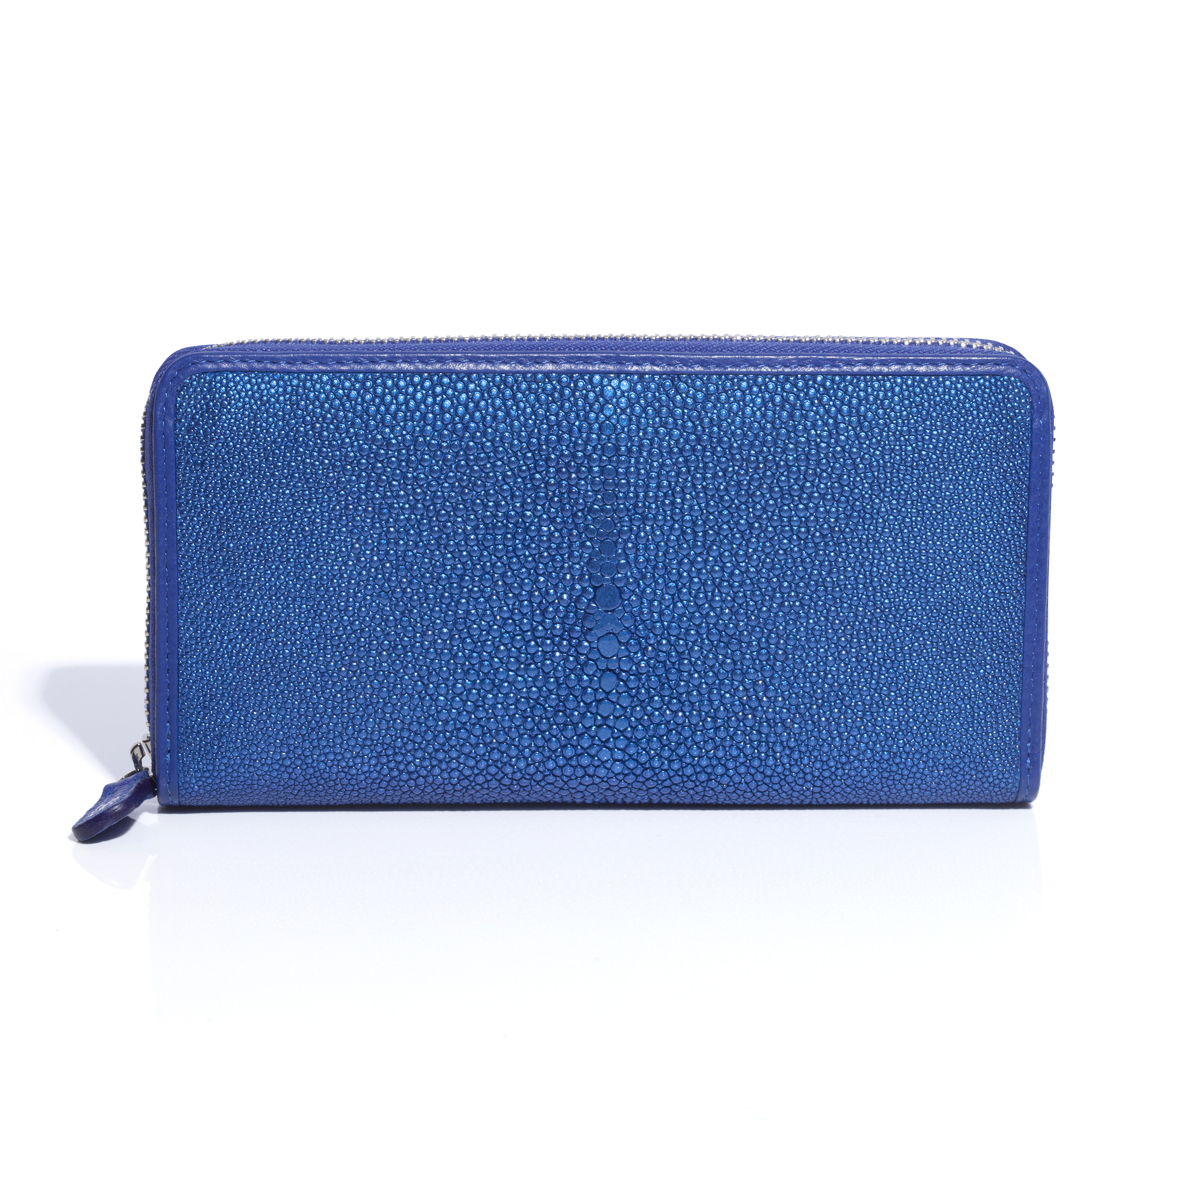 "BAHARI ""海の宝石箱""と呼ばれるほどの耐久性と美しさ   ガルーシャ(エイ革)長財布"